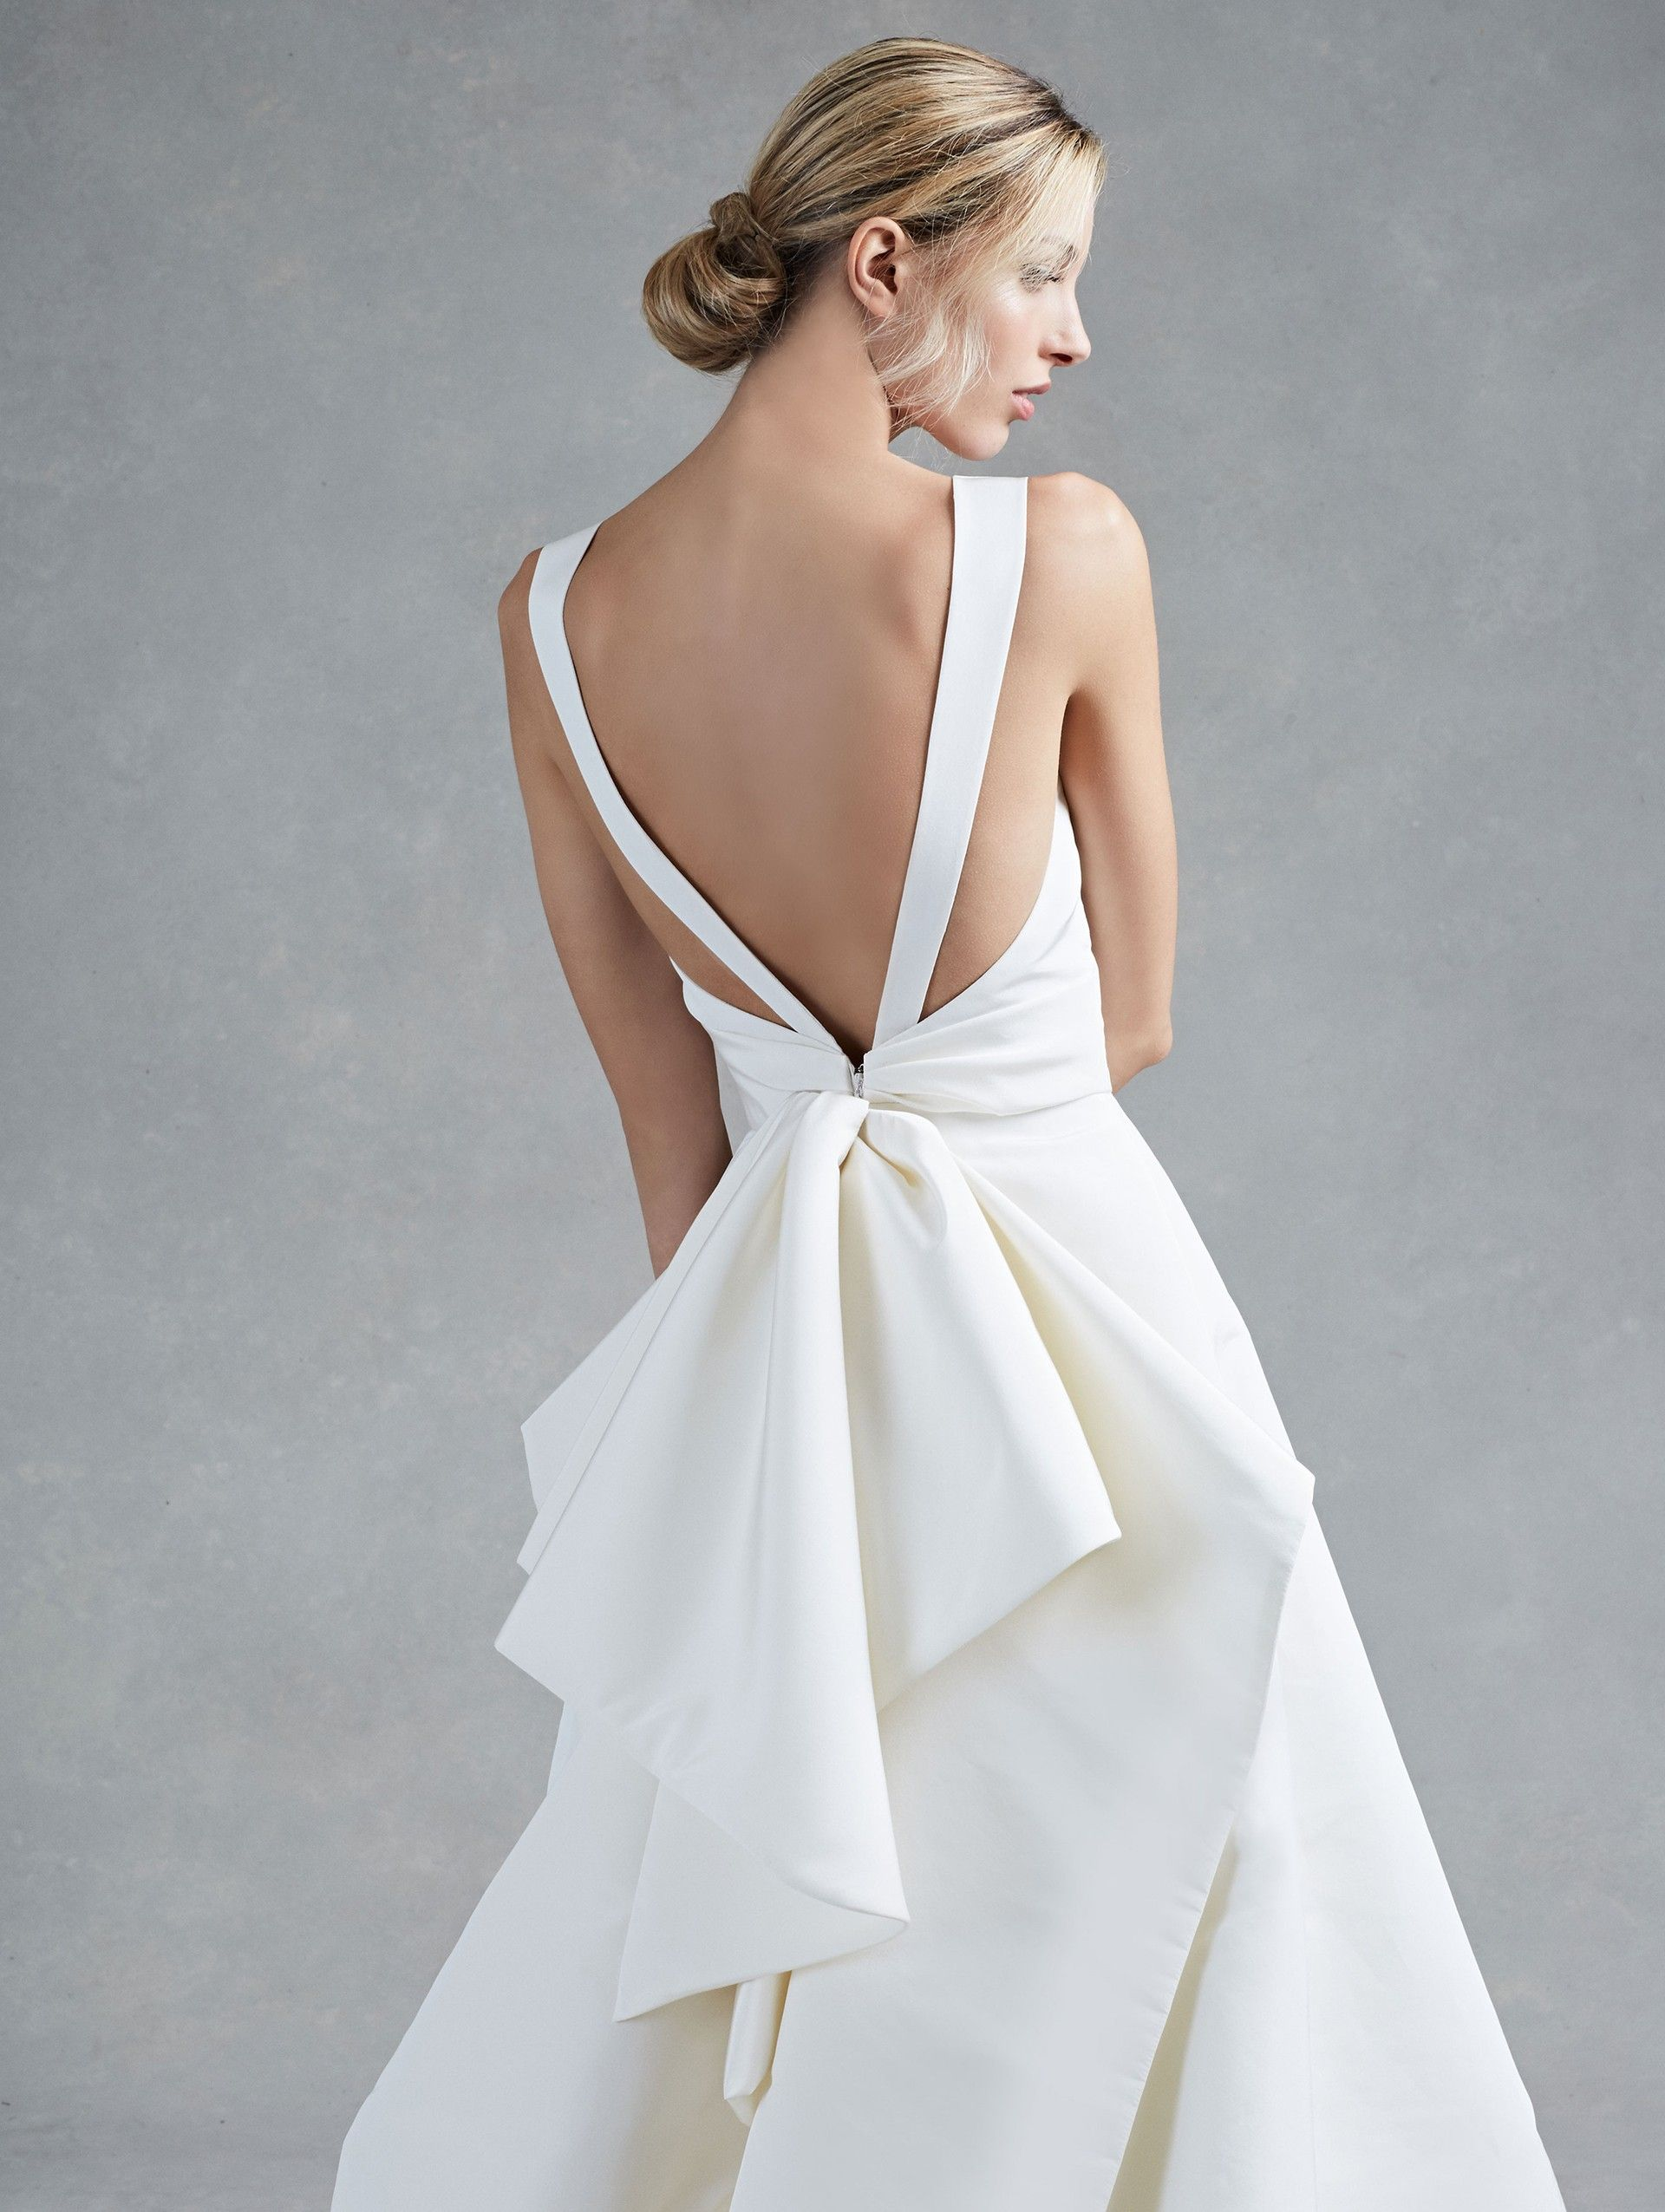 Runway Oscar De La A New York Herbst 2017 Bridal Kollektionen Fashion Shows Vogue